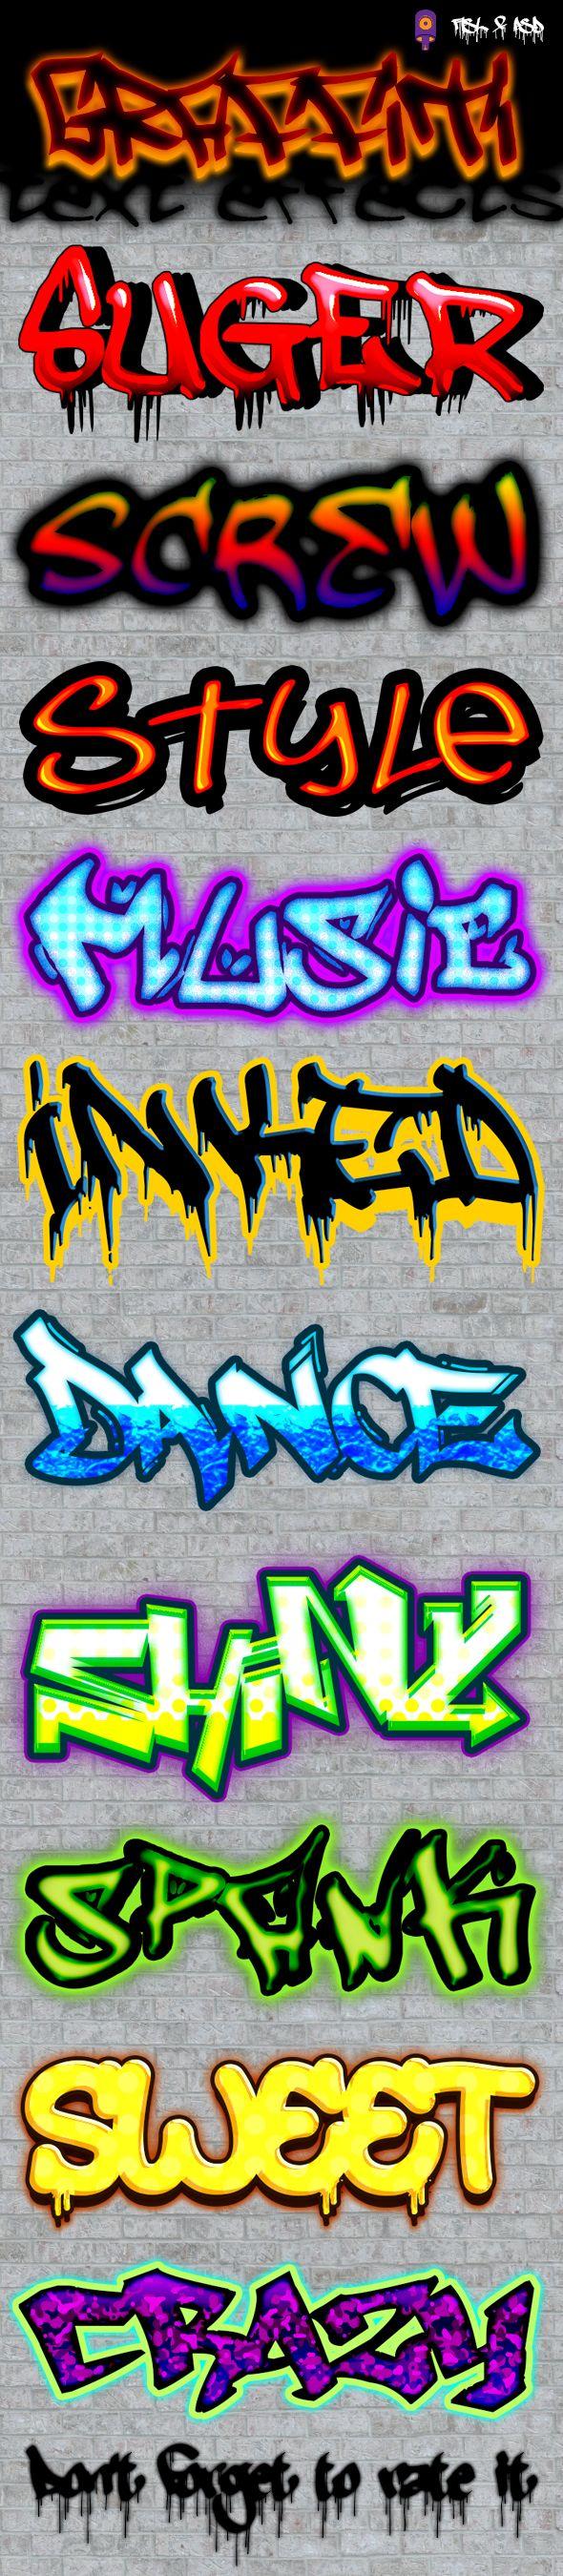 Graffiti Logo Maker | Free Online Design Tool